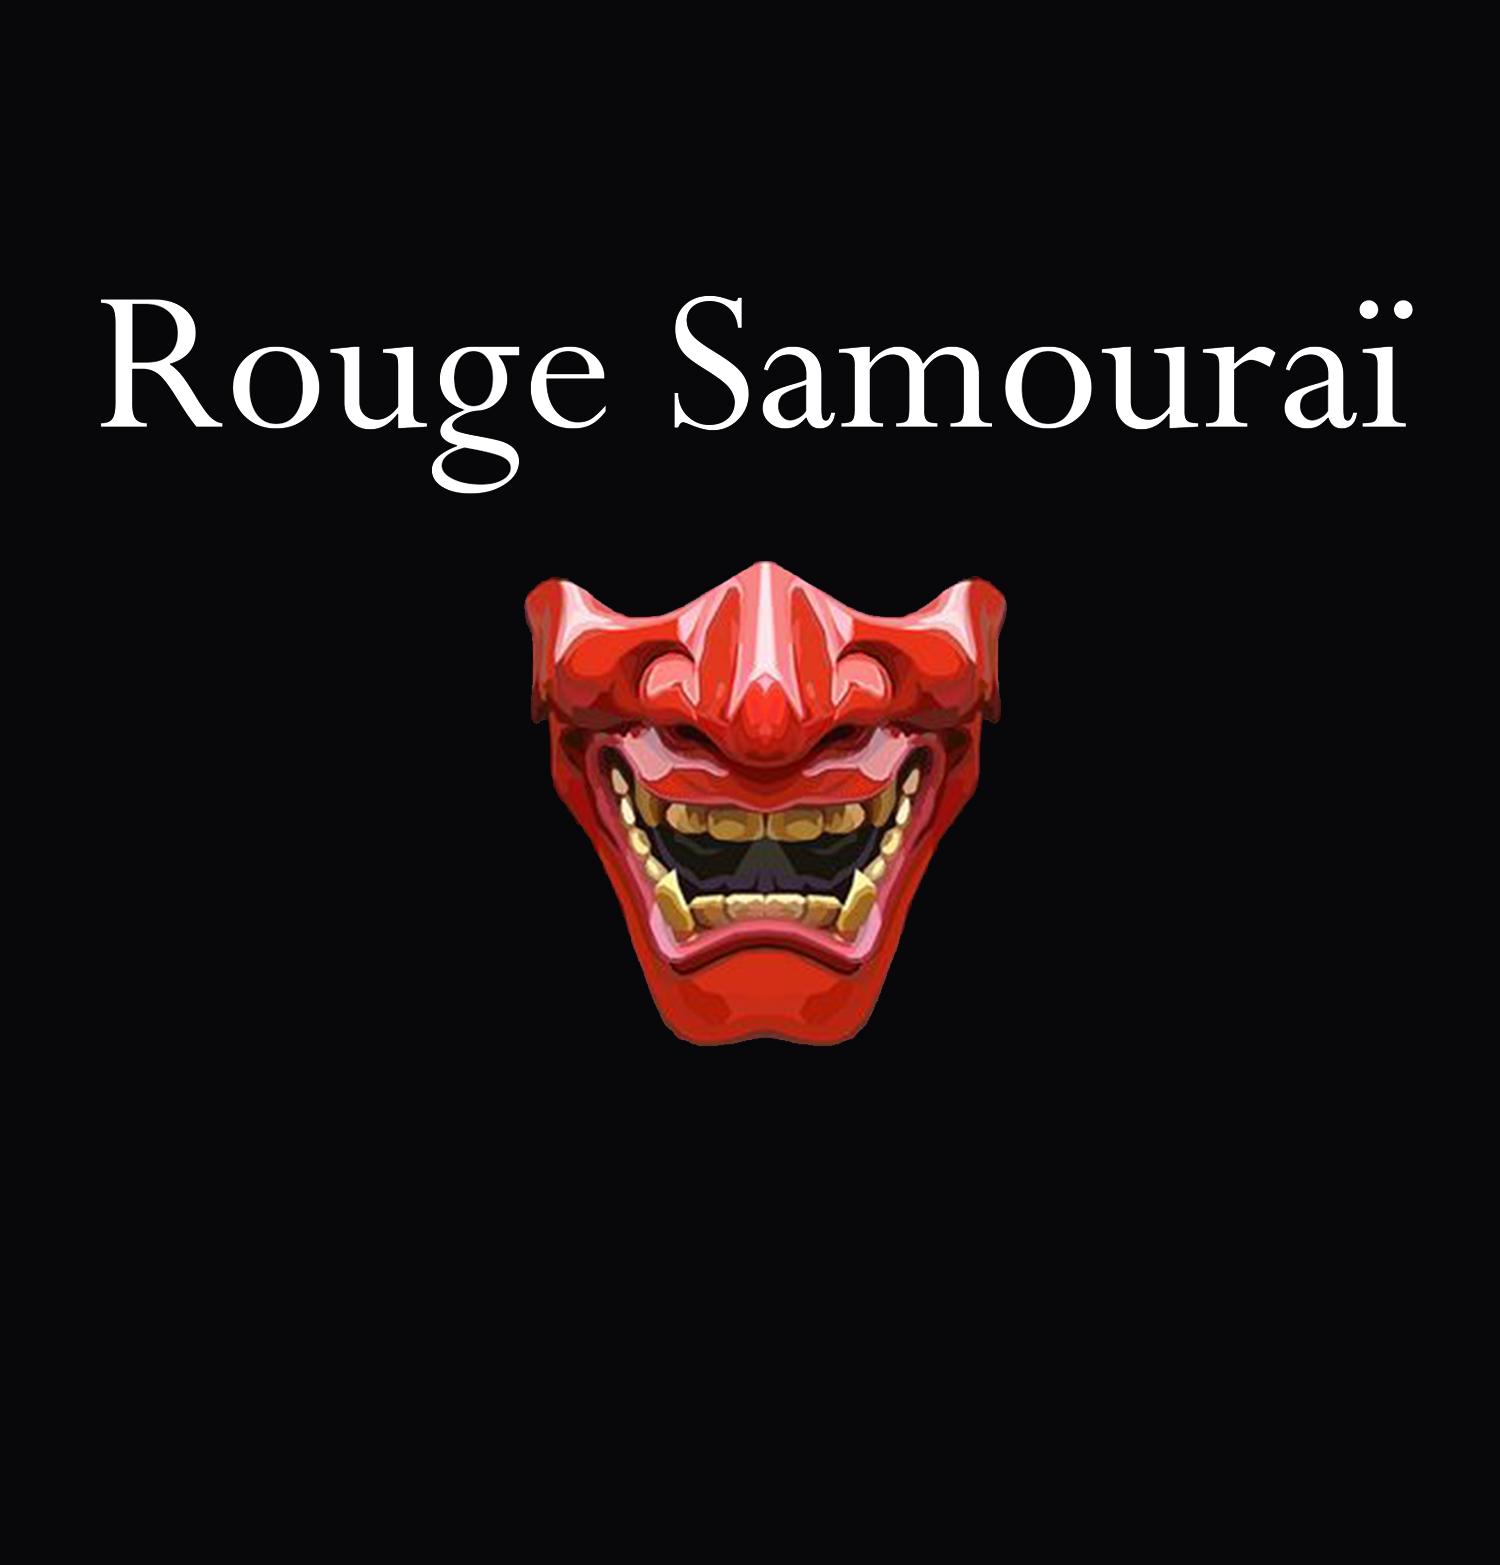 rouge samouraï